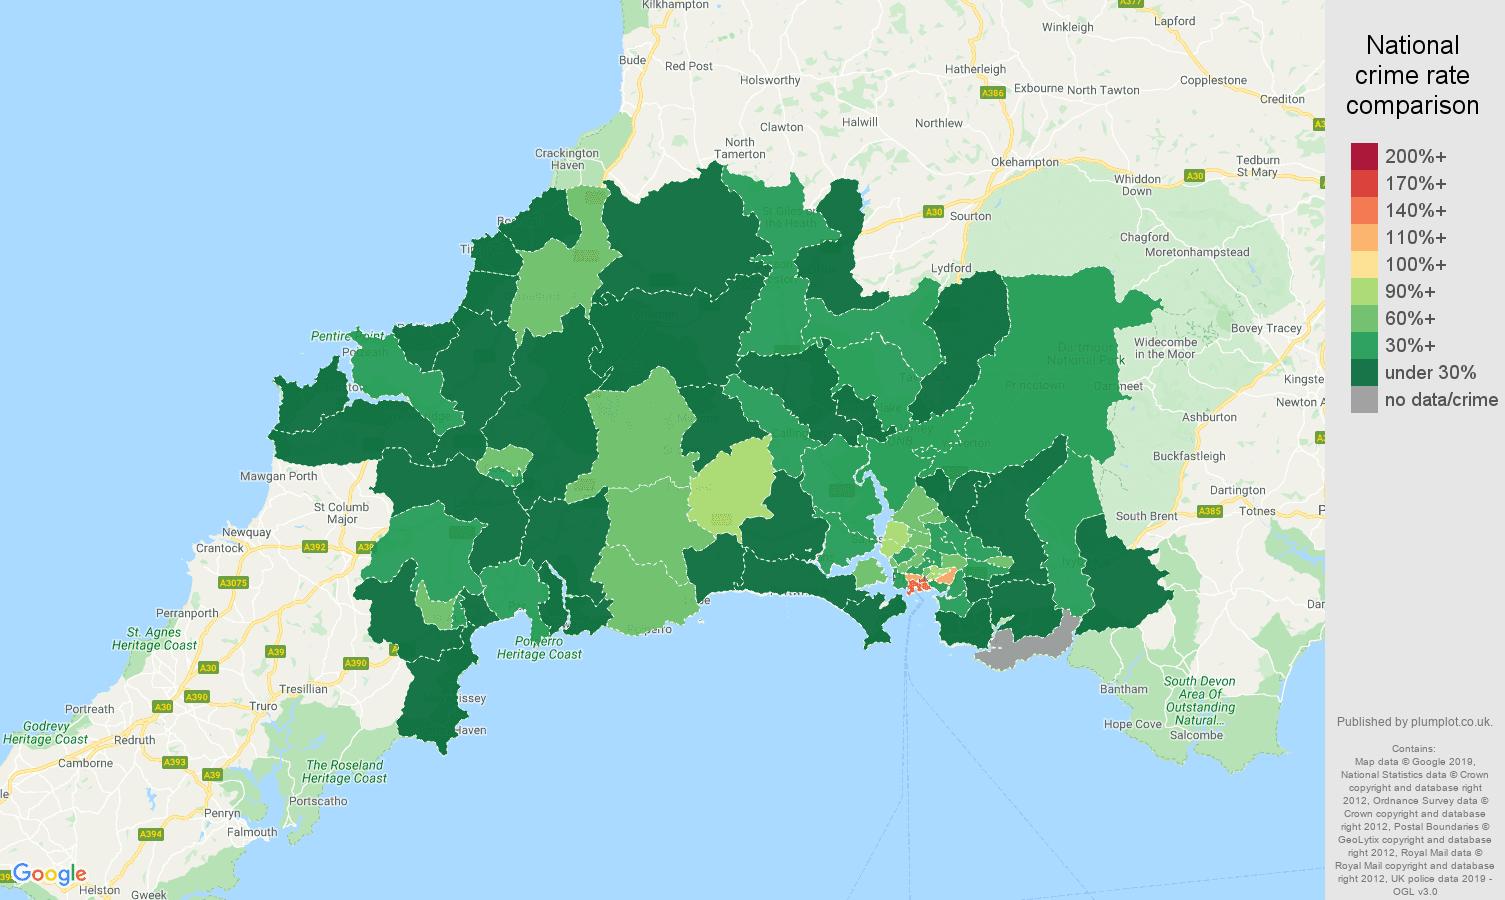 Plymouth public order crime rate comparison map